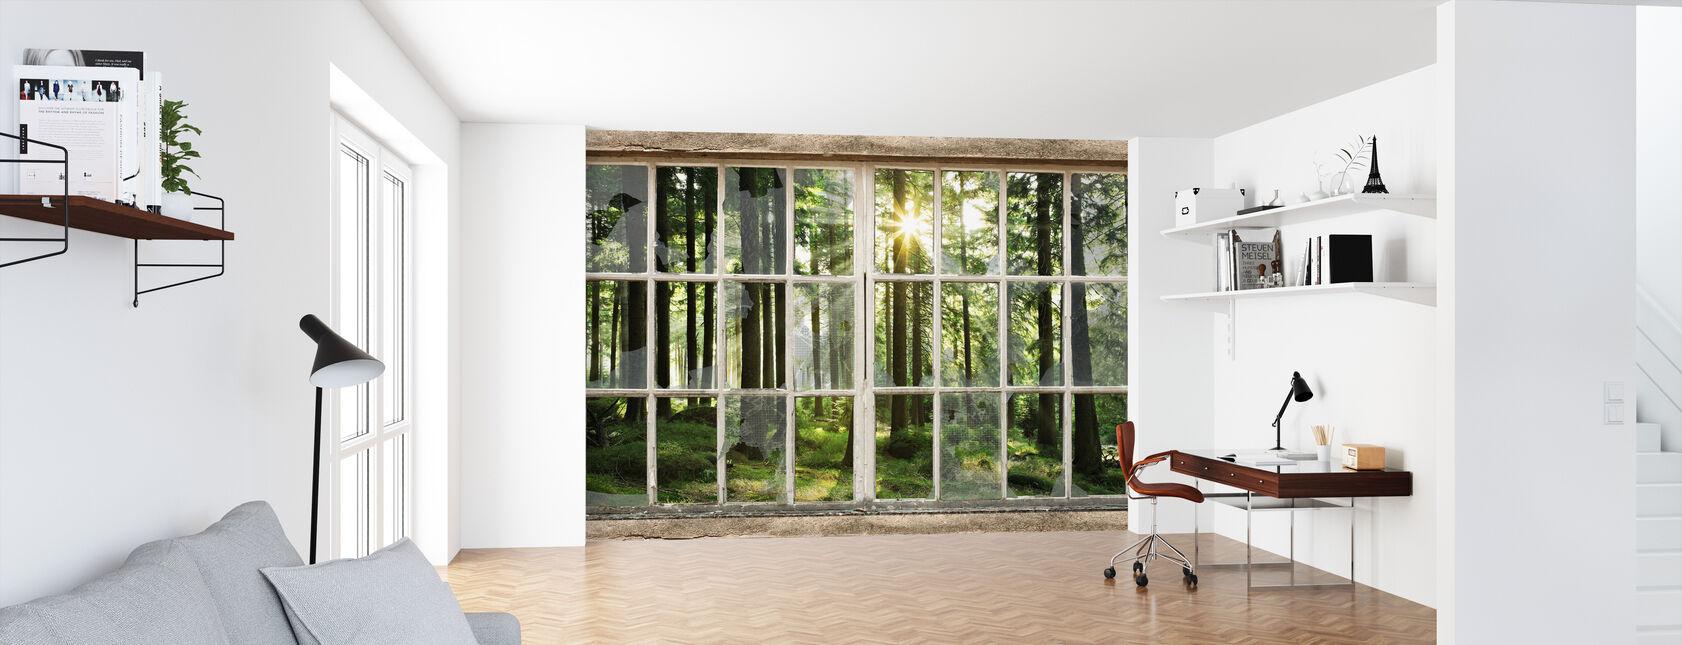 Sonnenuntergang im Wald durch zerbrochenes Fenster - Tapete - Büro